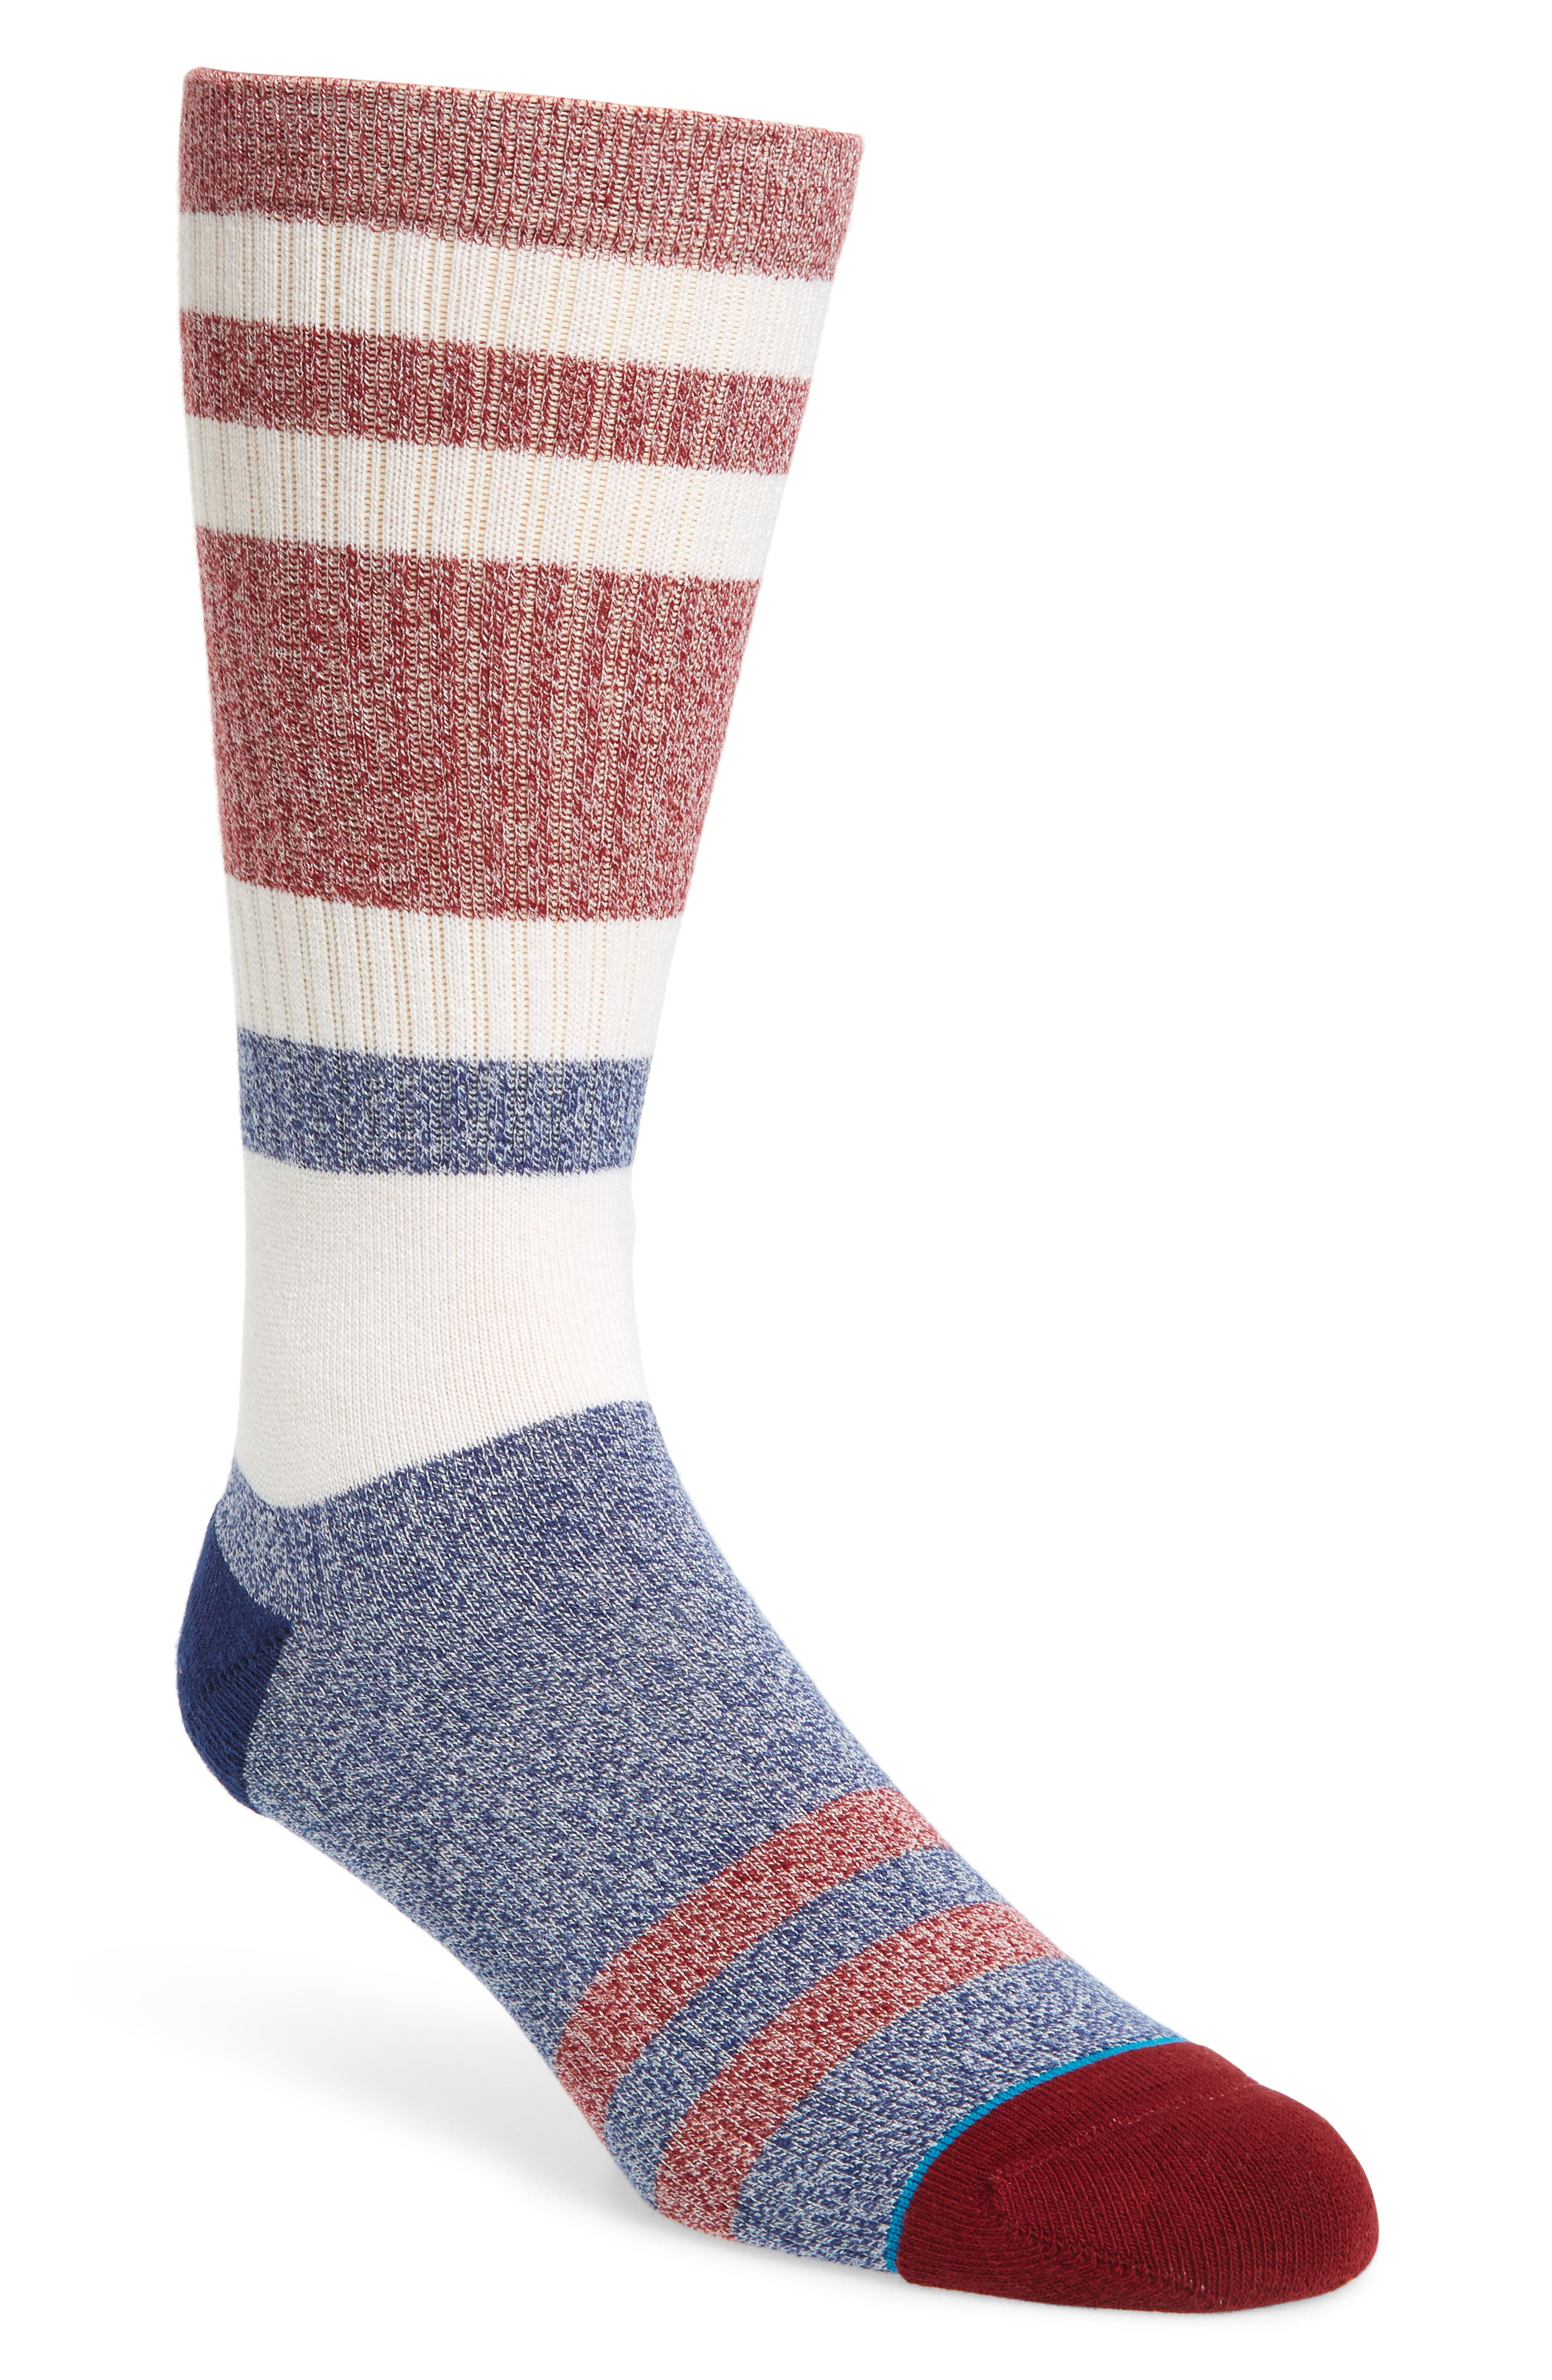 Robinsen Crew Socks,                             Main thumbnail 1, color,                             600